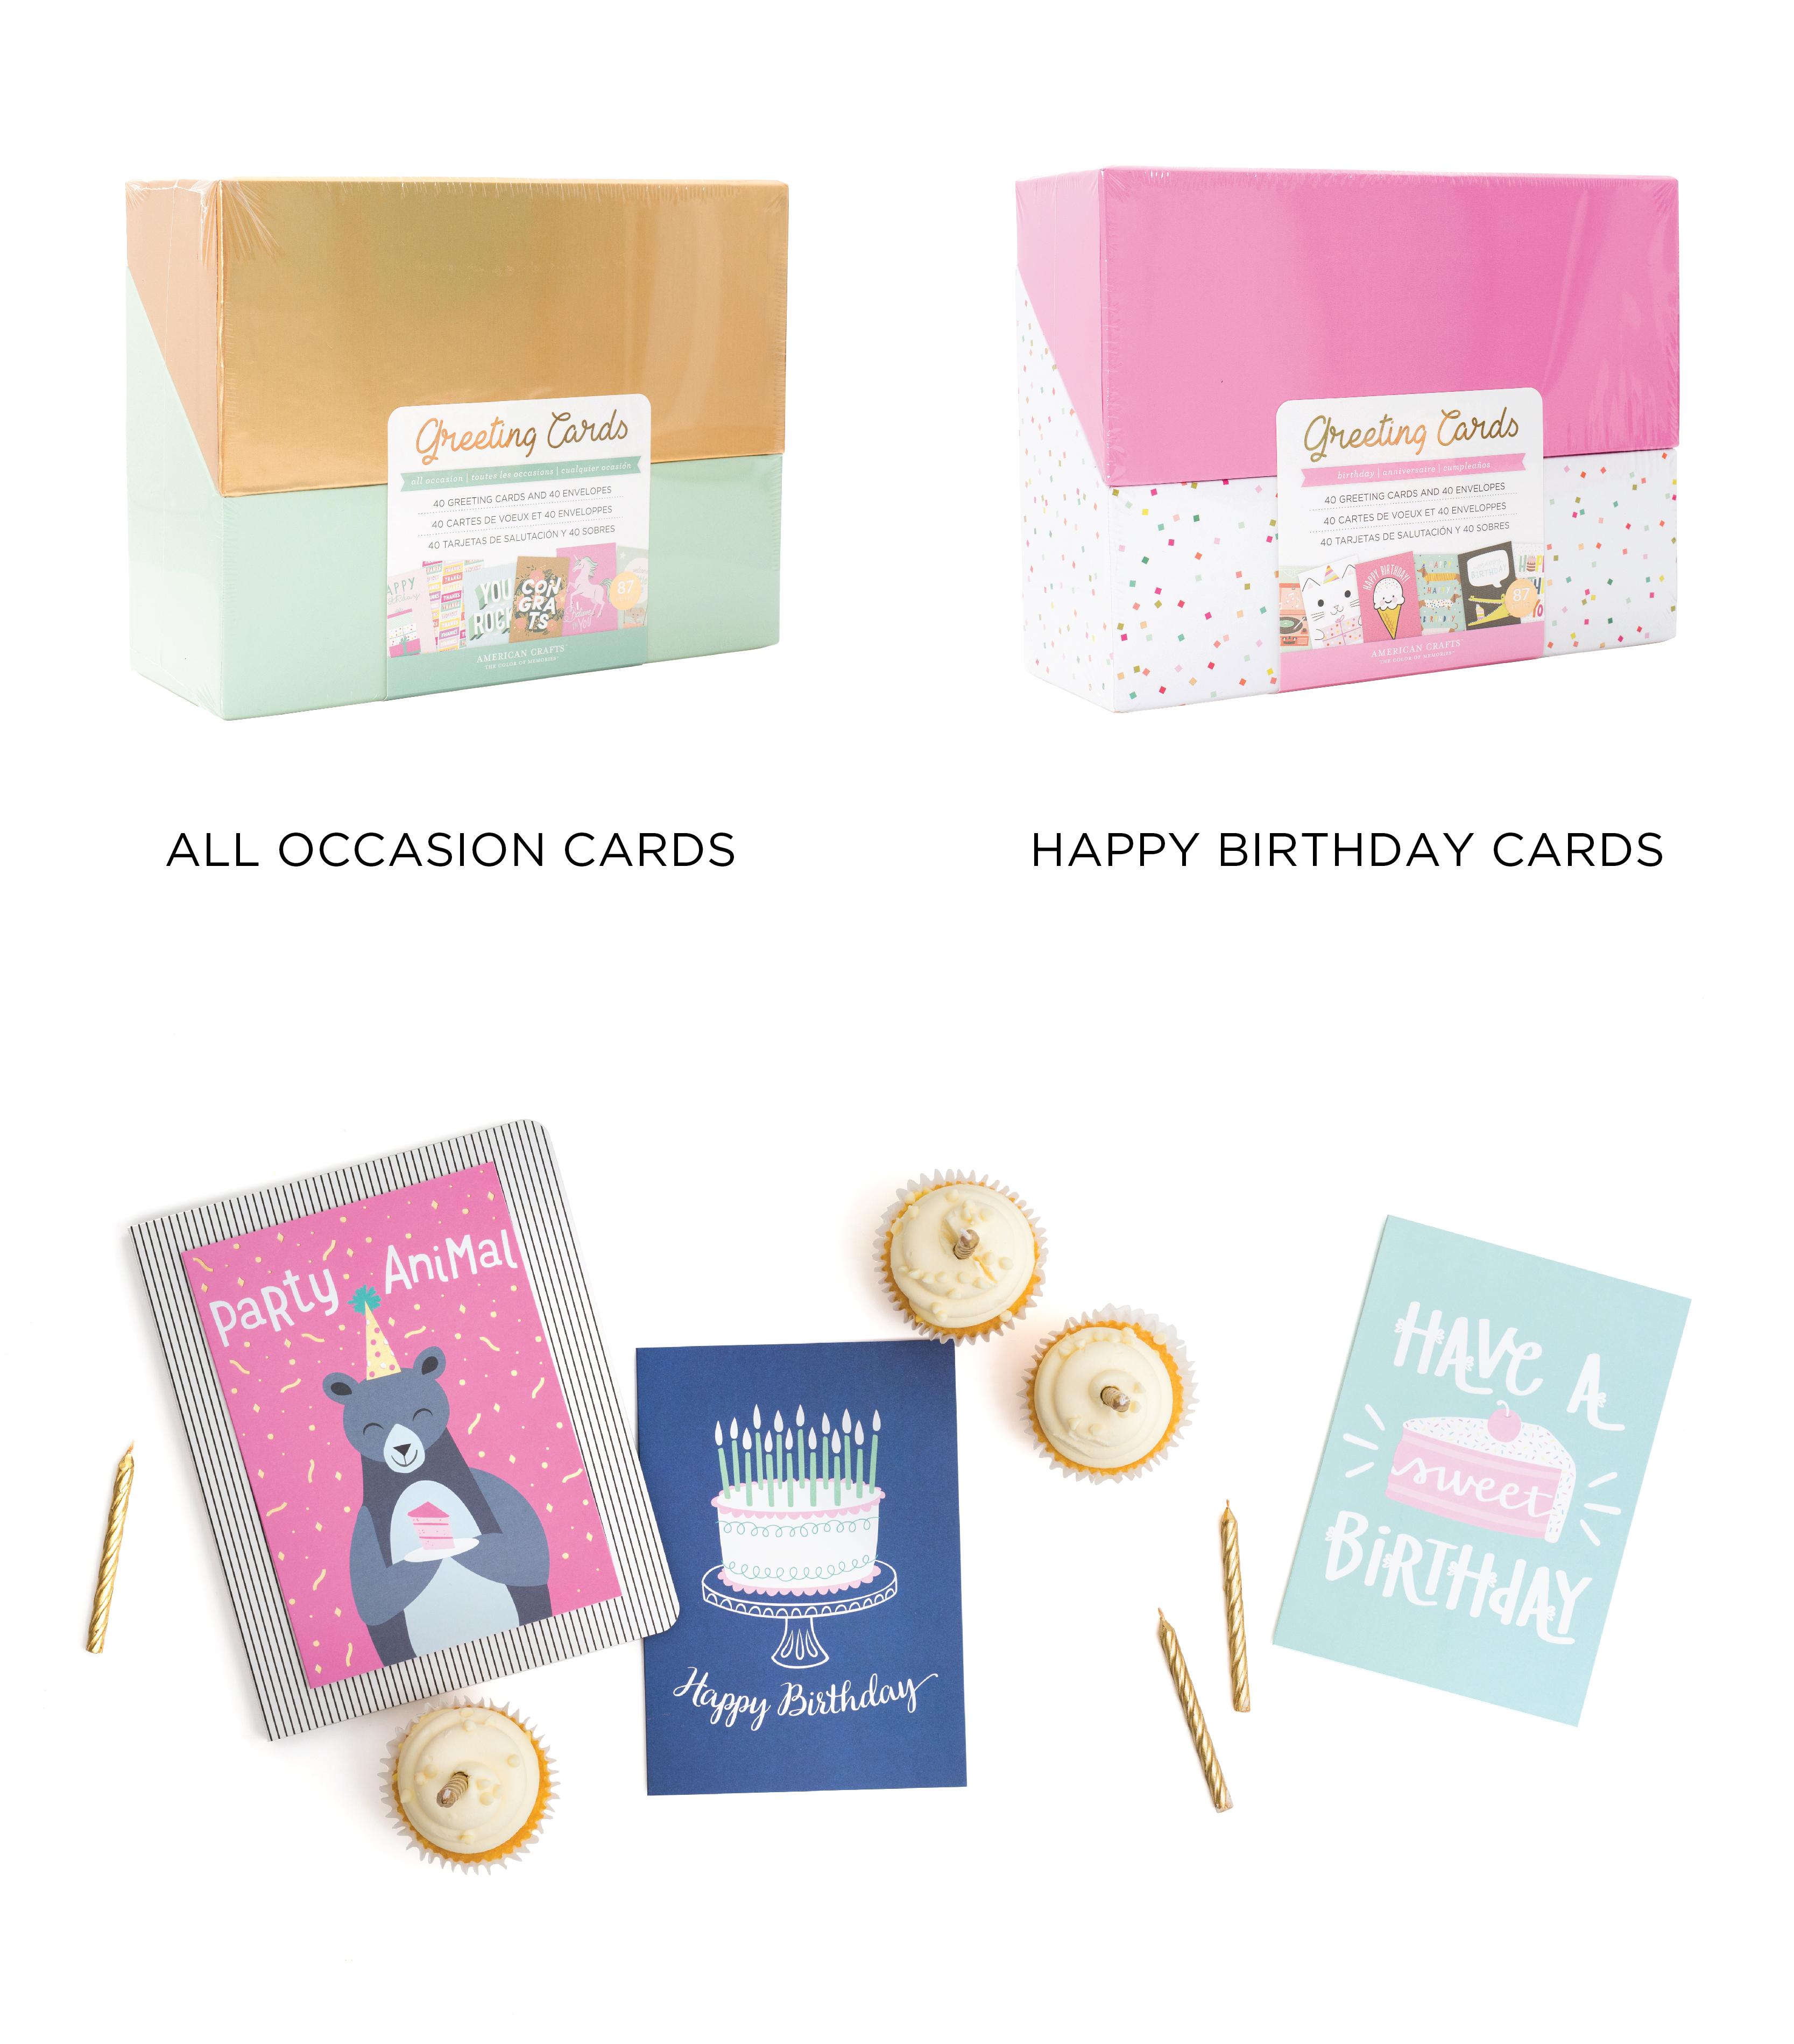 Introducing Greeting Card Value Packs GreetingCardValueBundleBlog Header Body